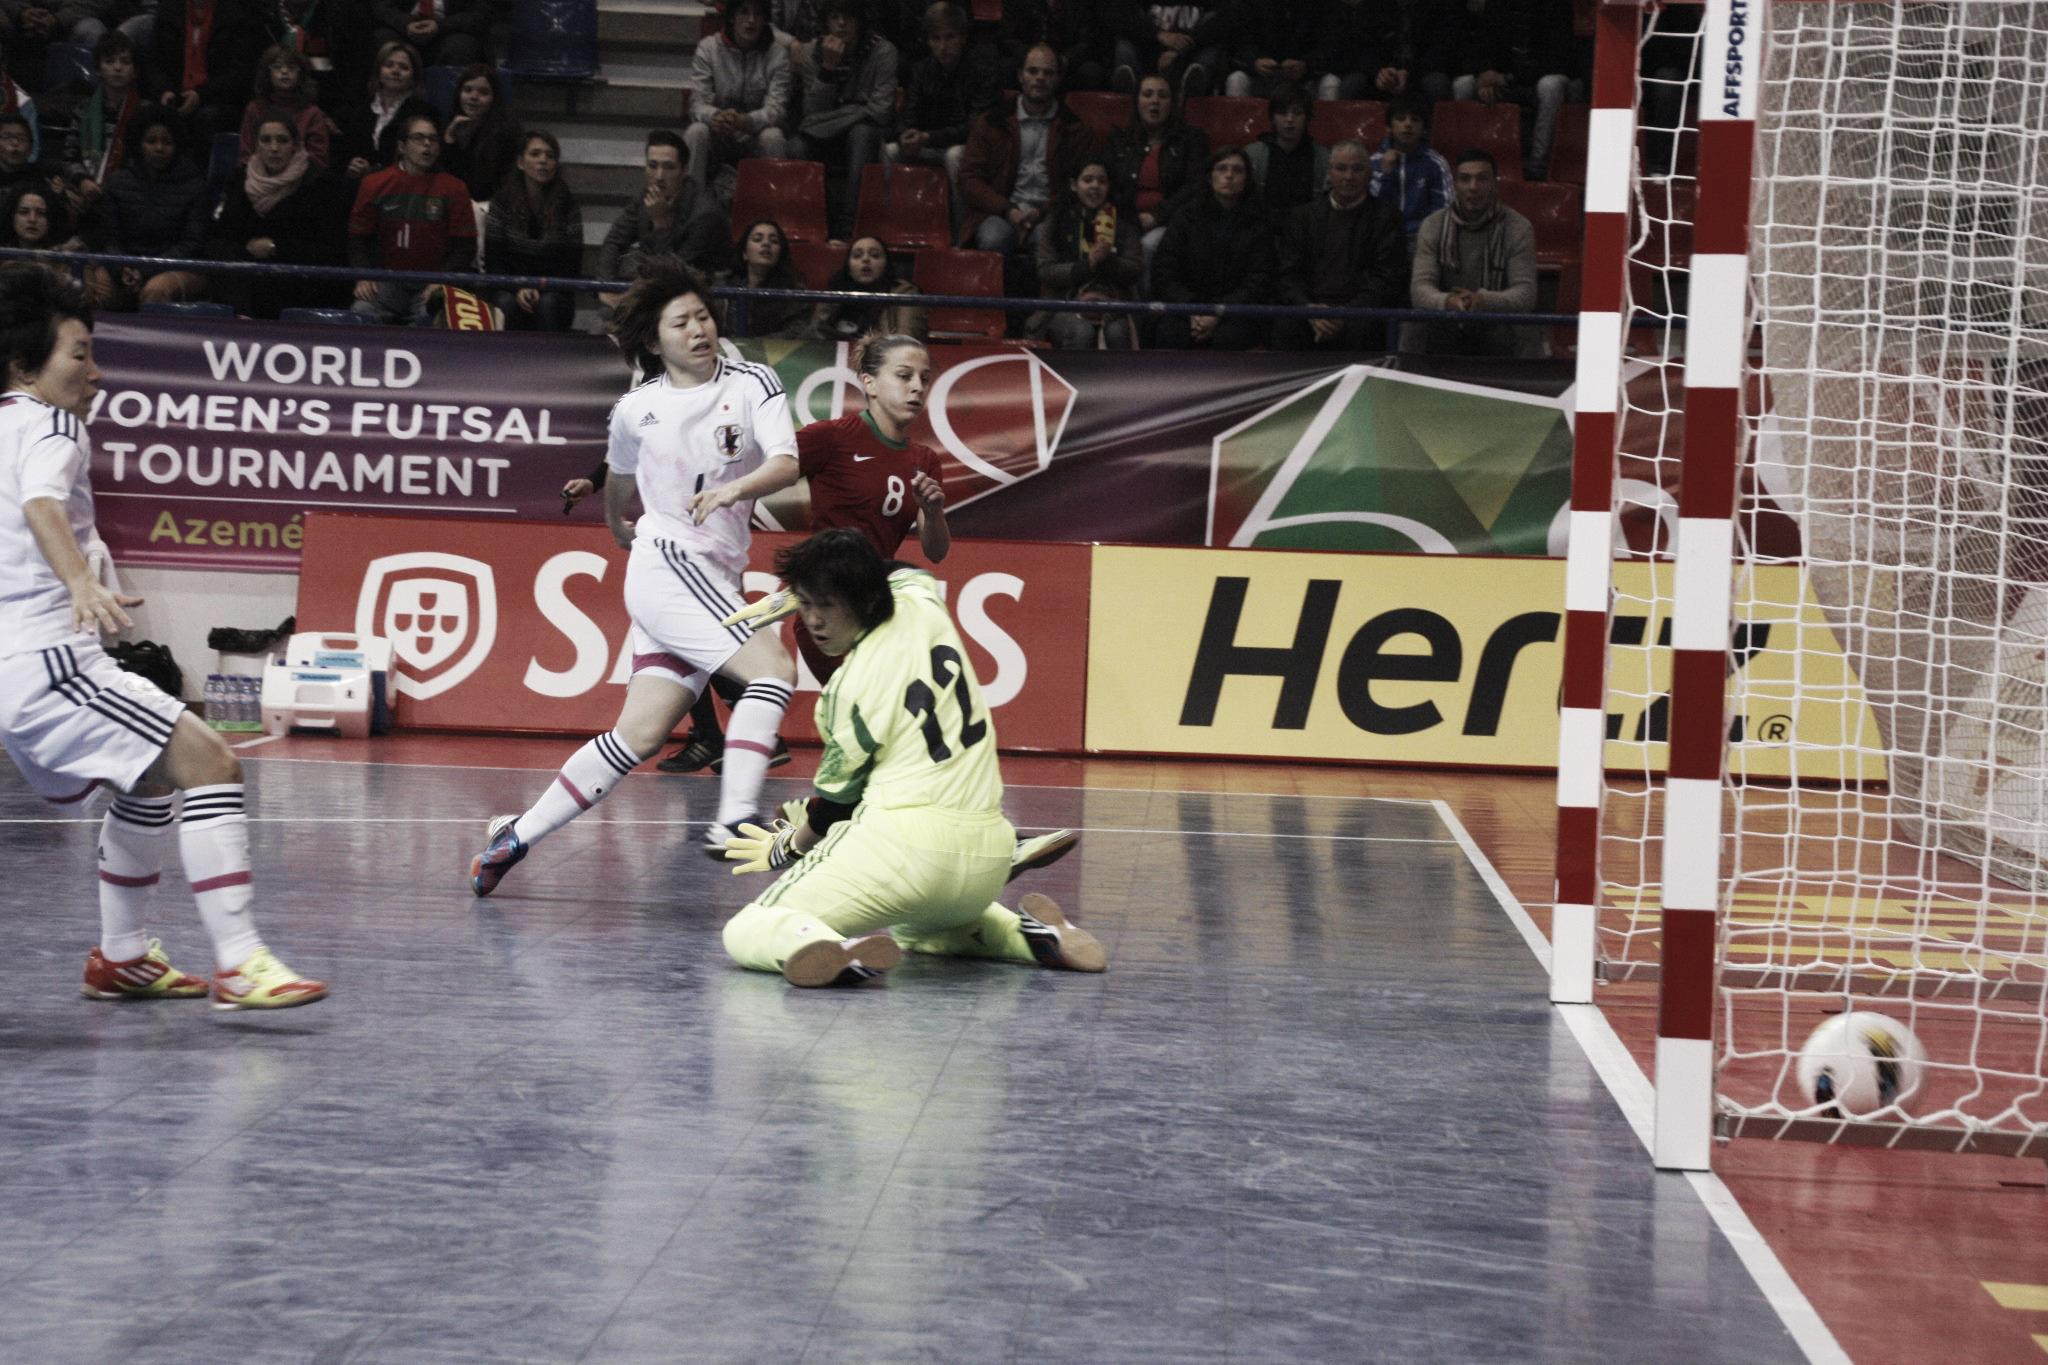 III mundial de fútbol sala femenino: primera jornada